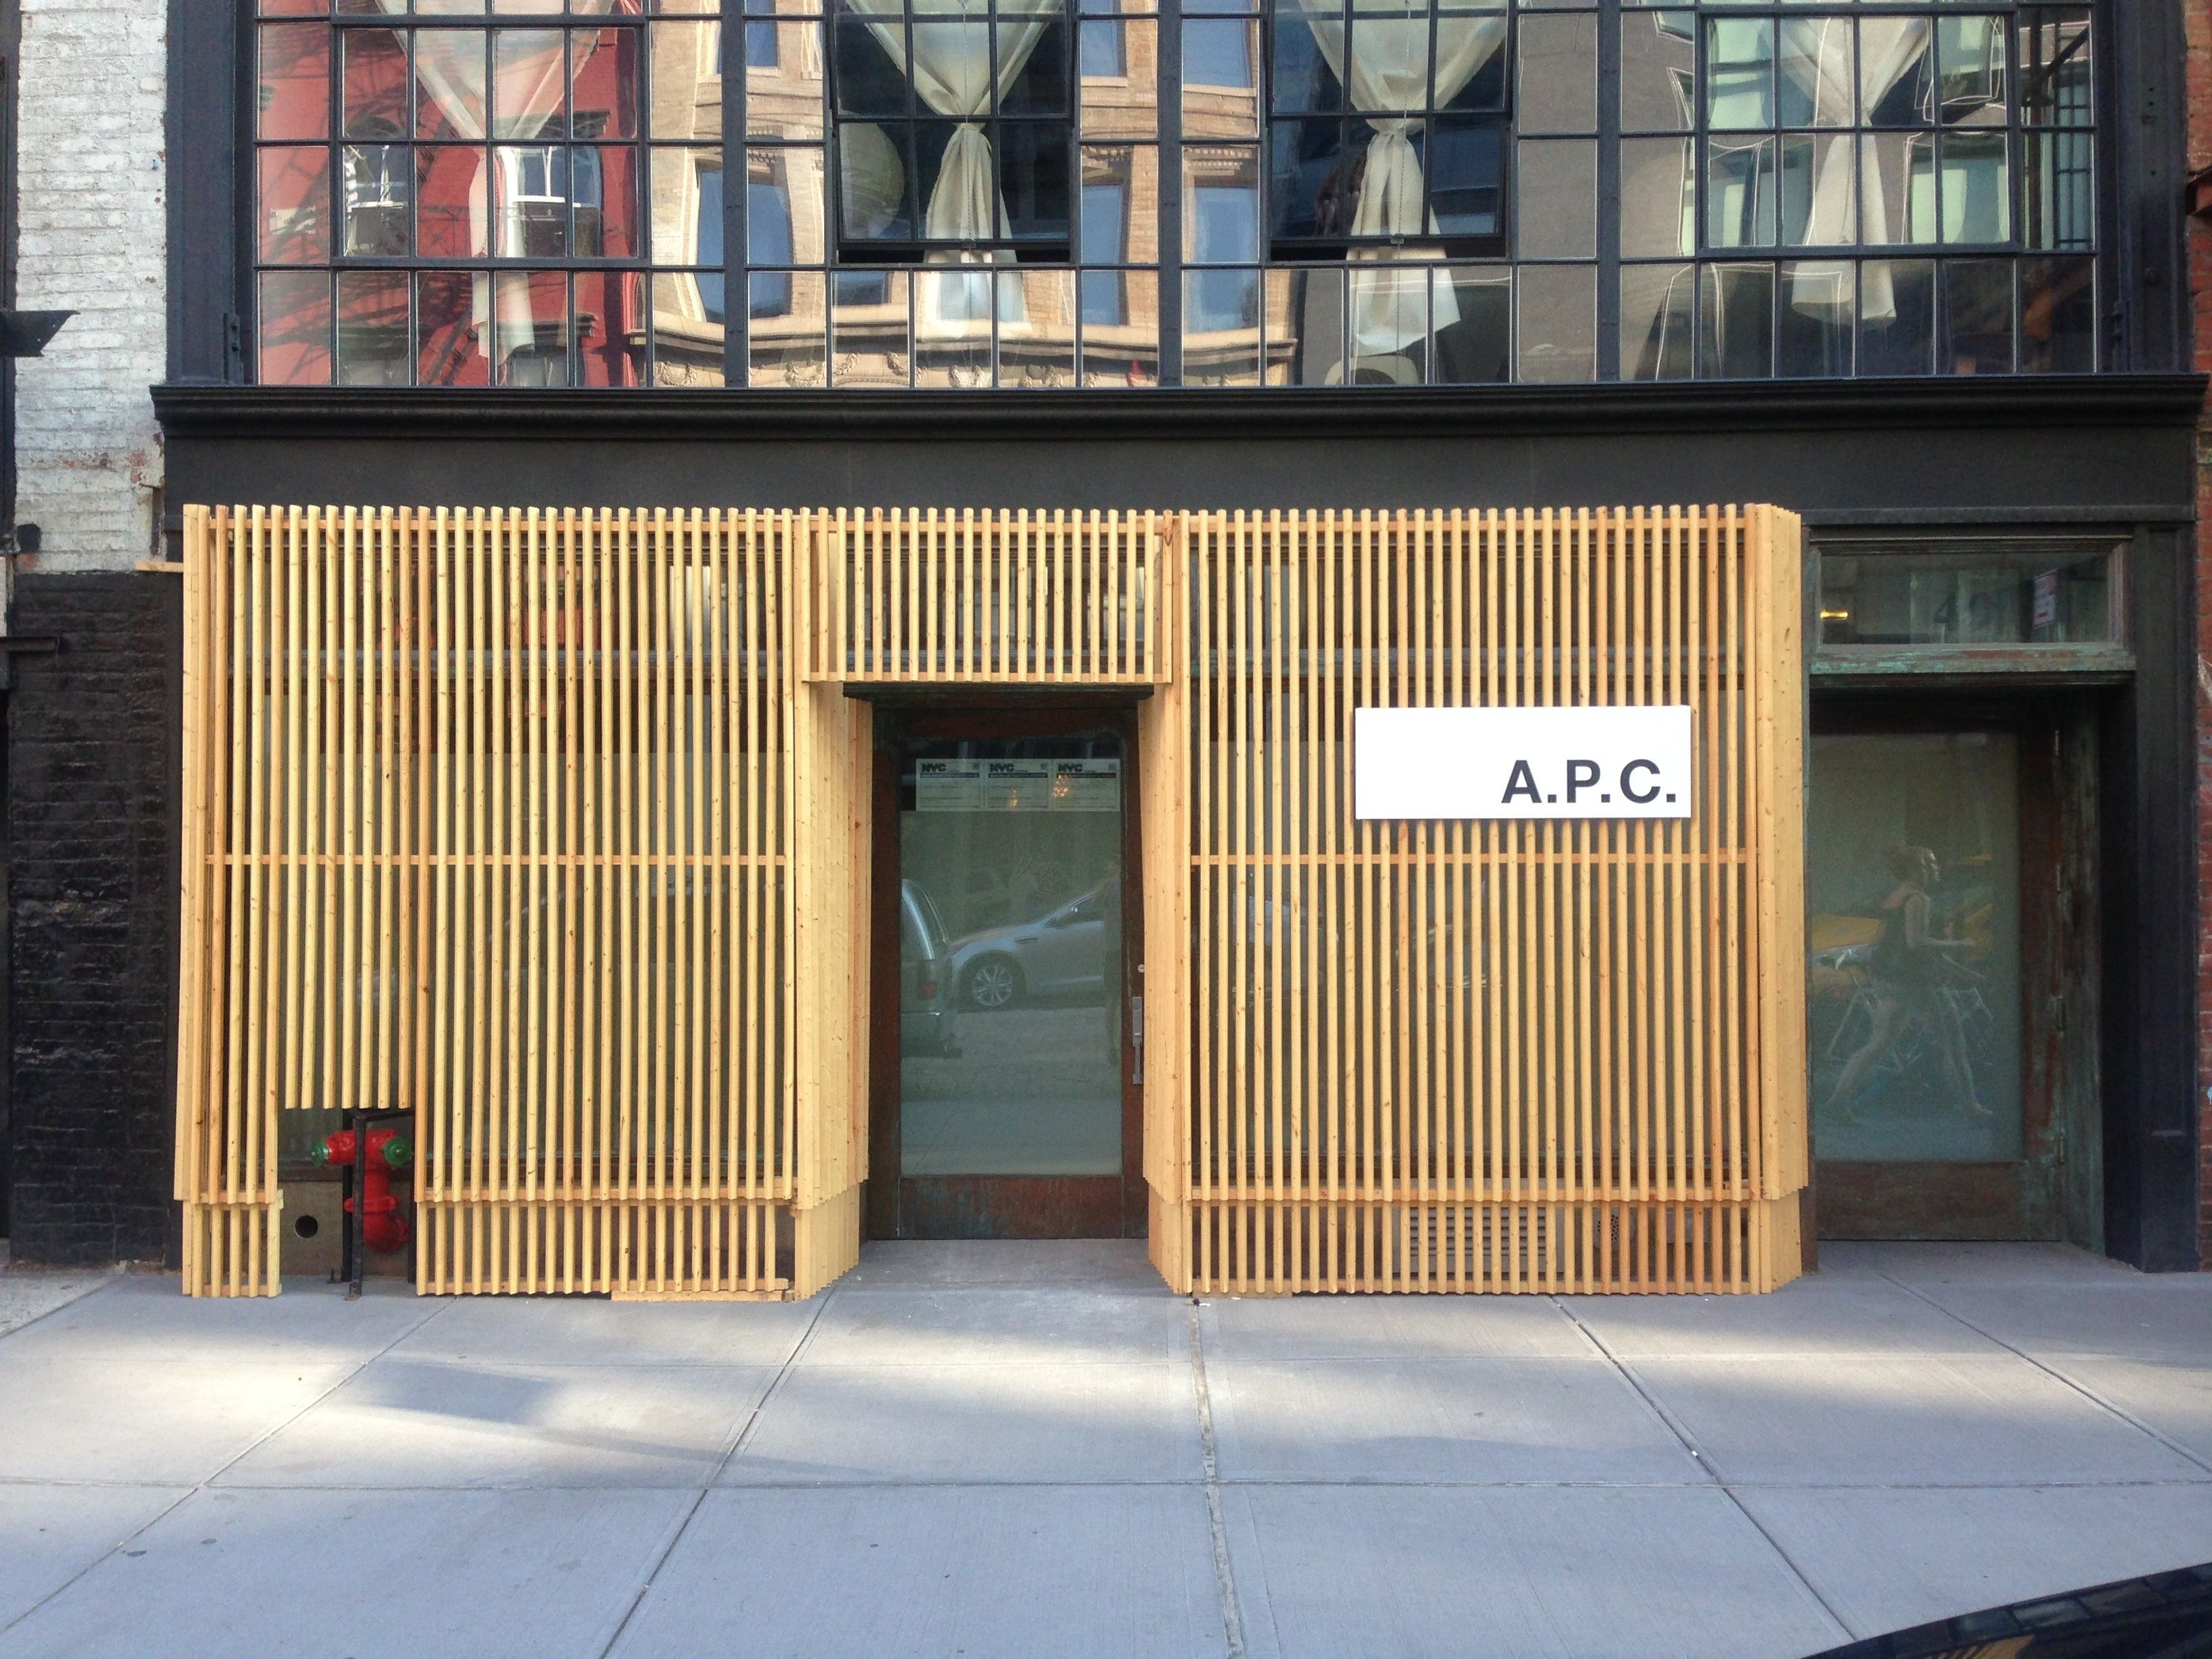 A P C  Bond Street | SA/DC | Bond street, Building facade, Garage doors